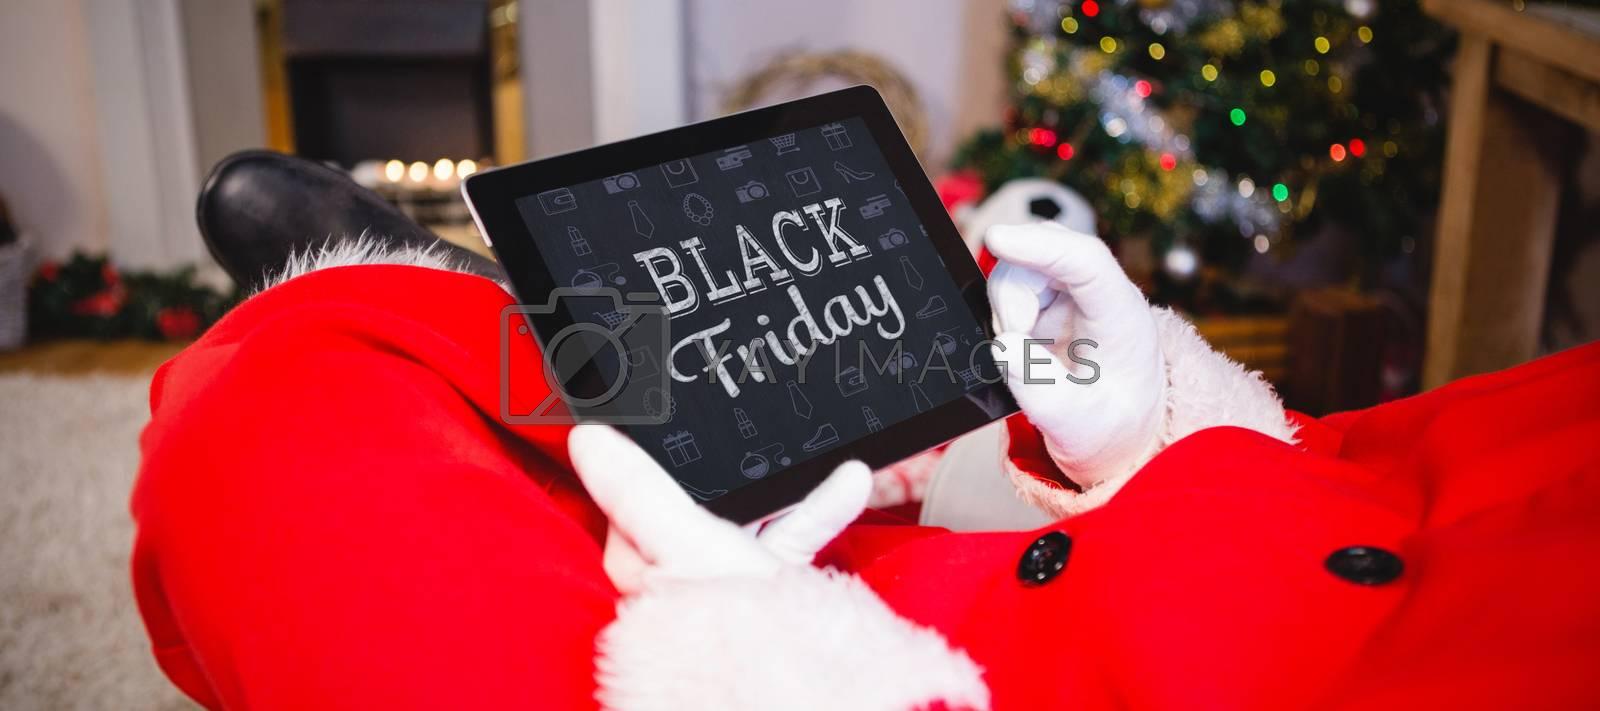 black friday against santa claus sitting and using digital tablet